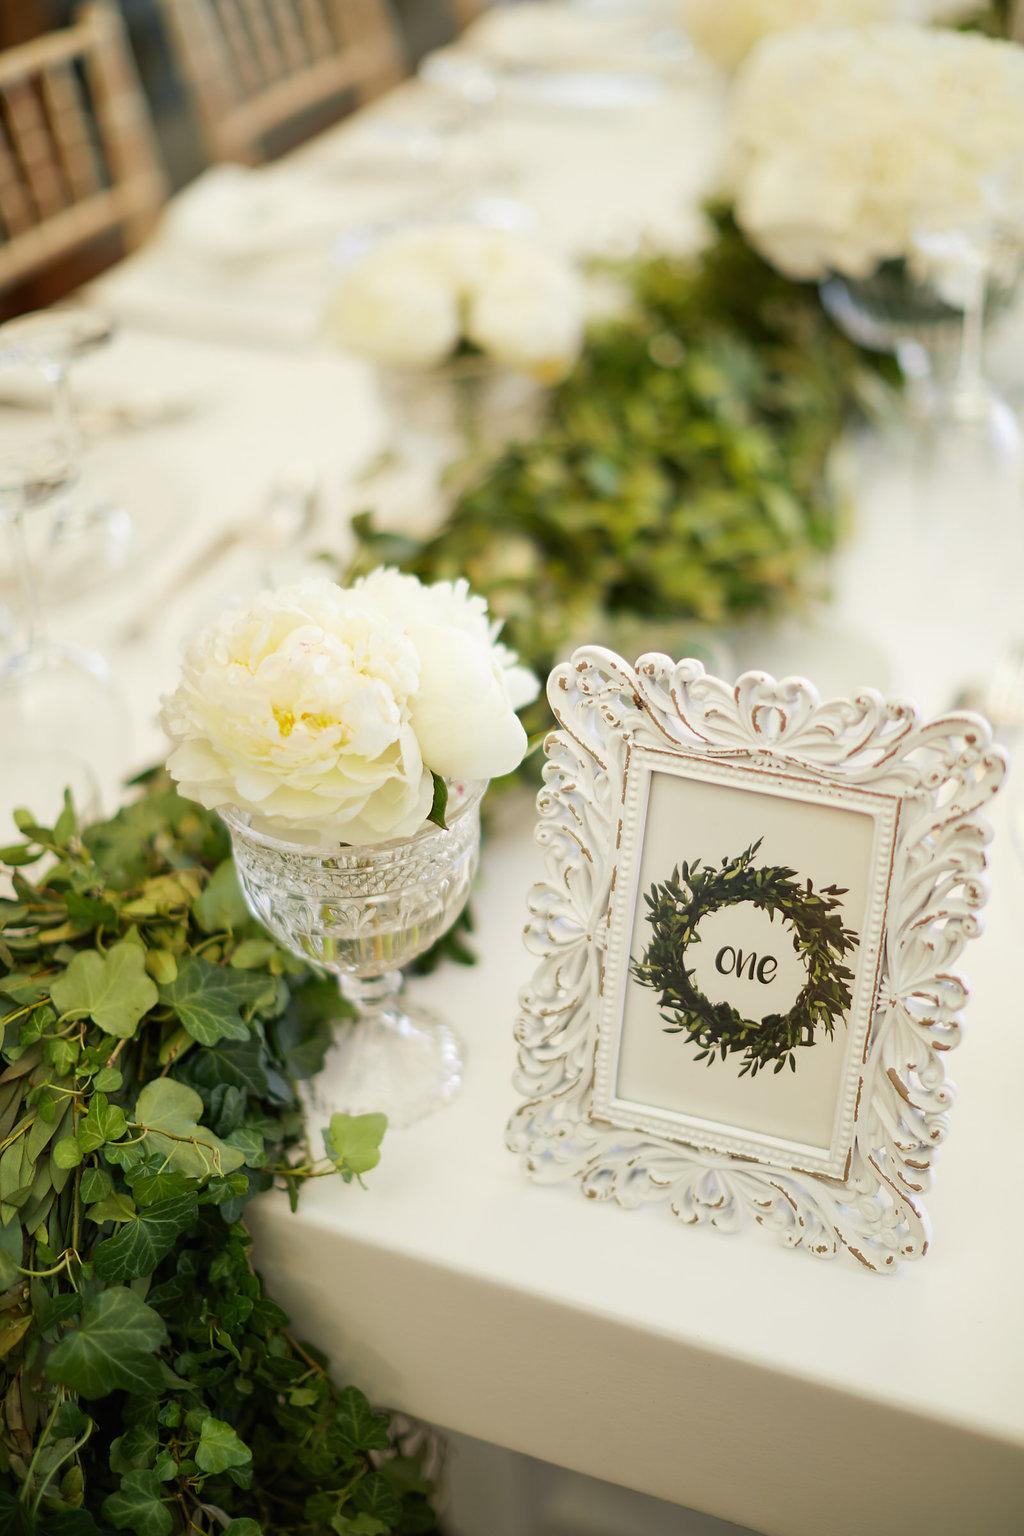 romantic vintage inspired weddings - photo by Sotiris Tsakanikas https://ruffledblog.com/chic-sunset-wedding-on-the-athens-riviera